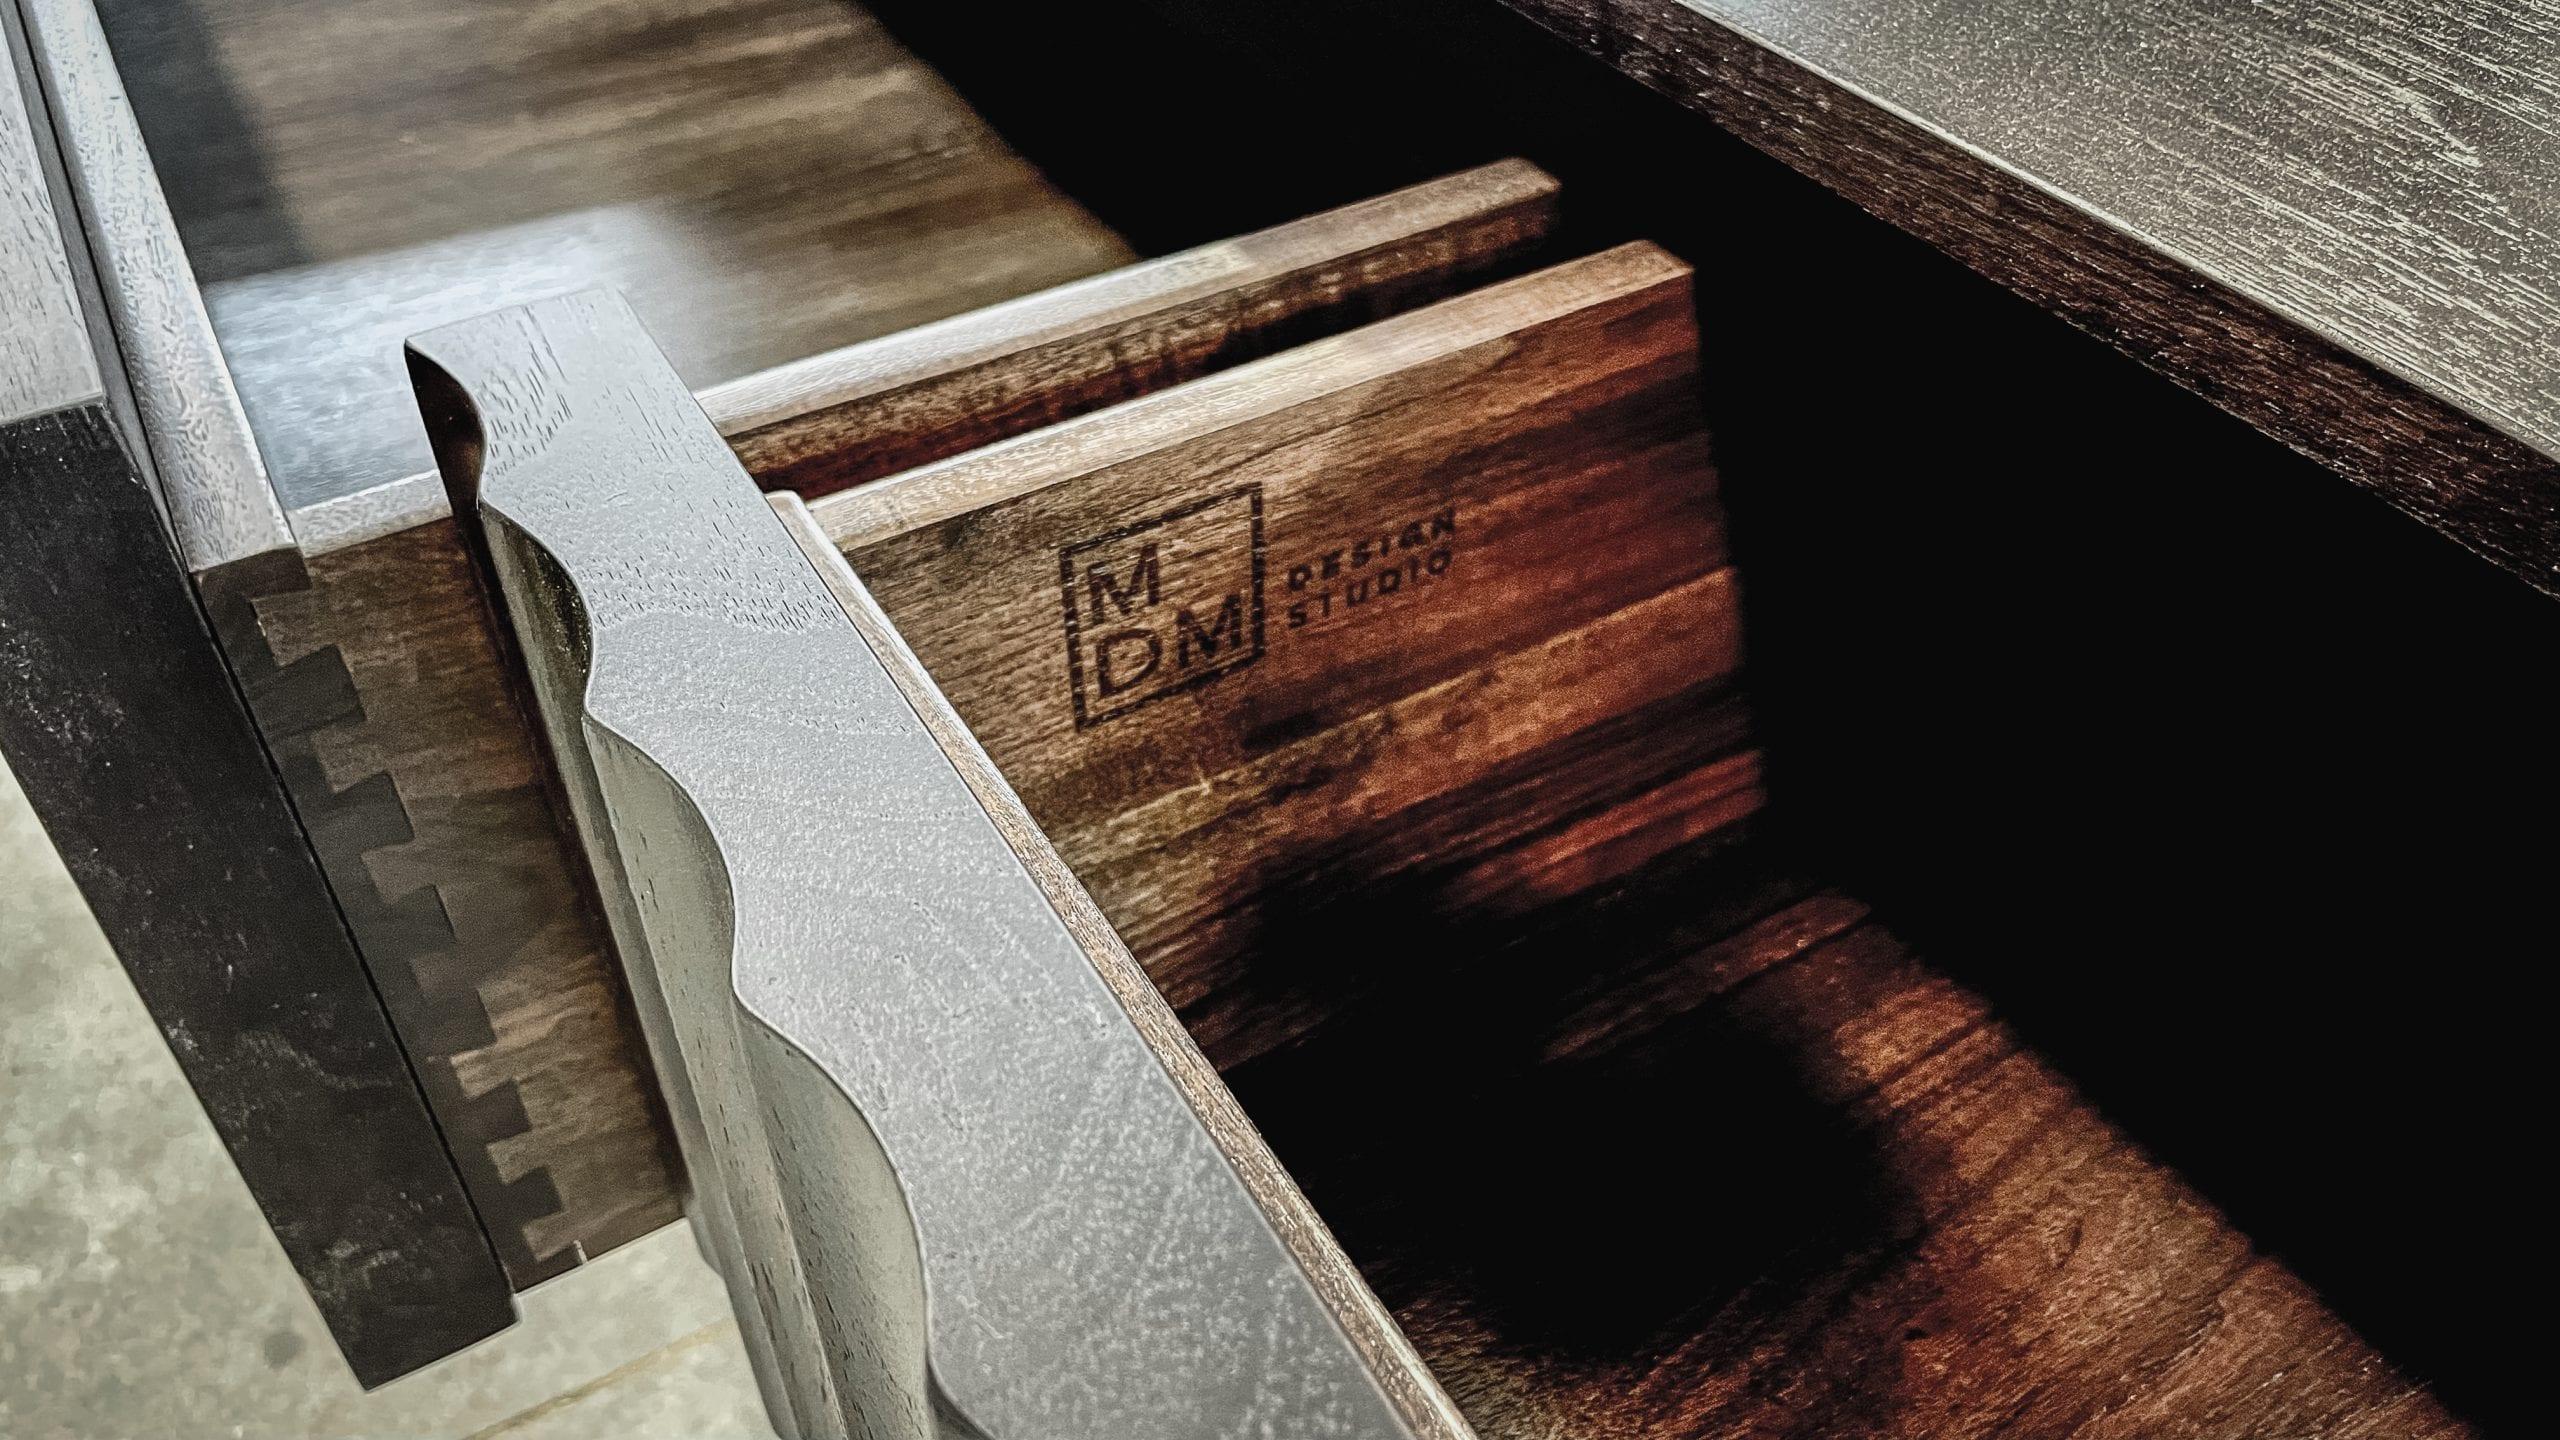 Drawer with MDM Wood Burning Detail